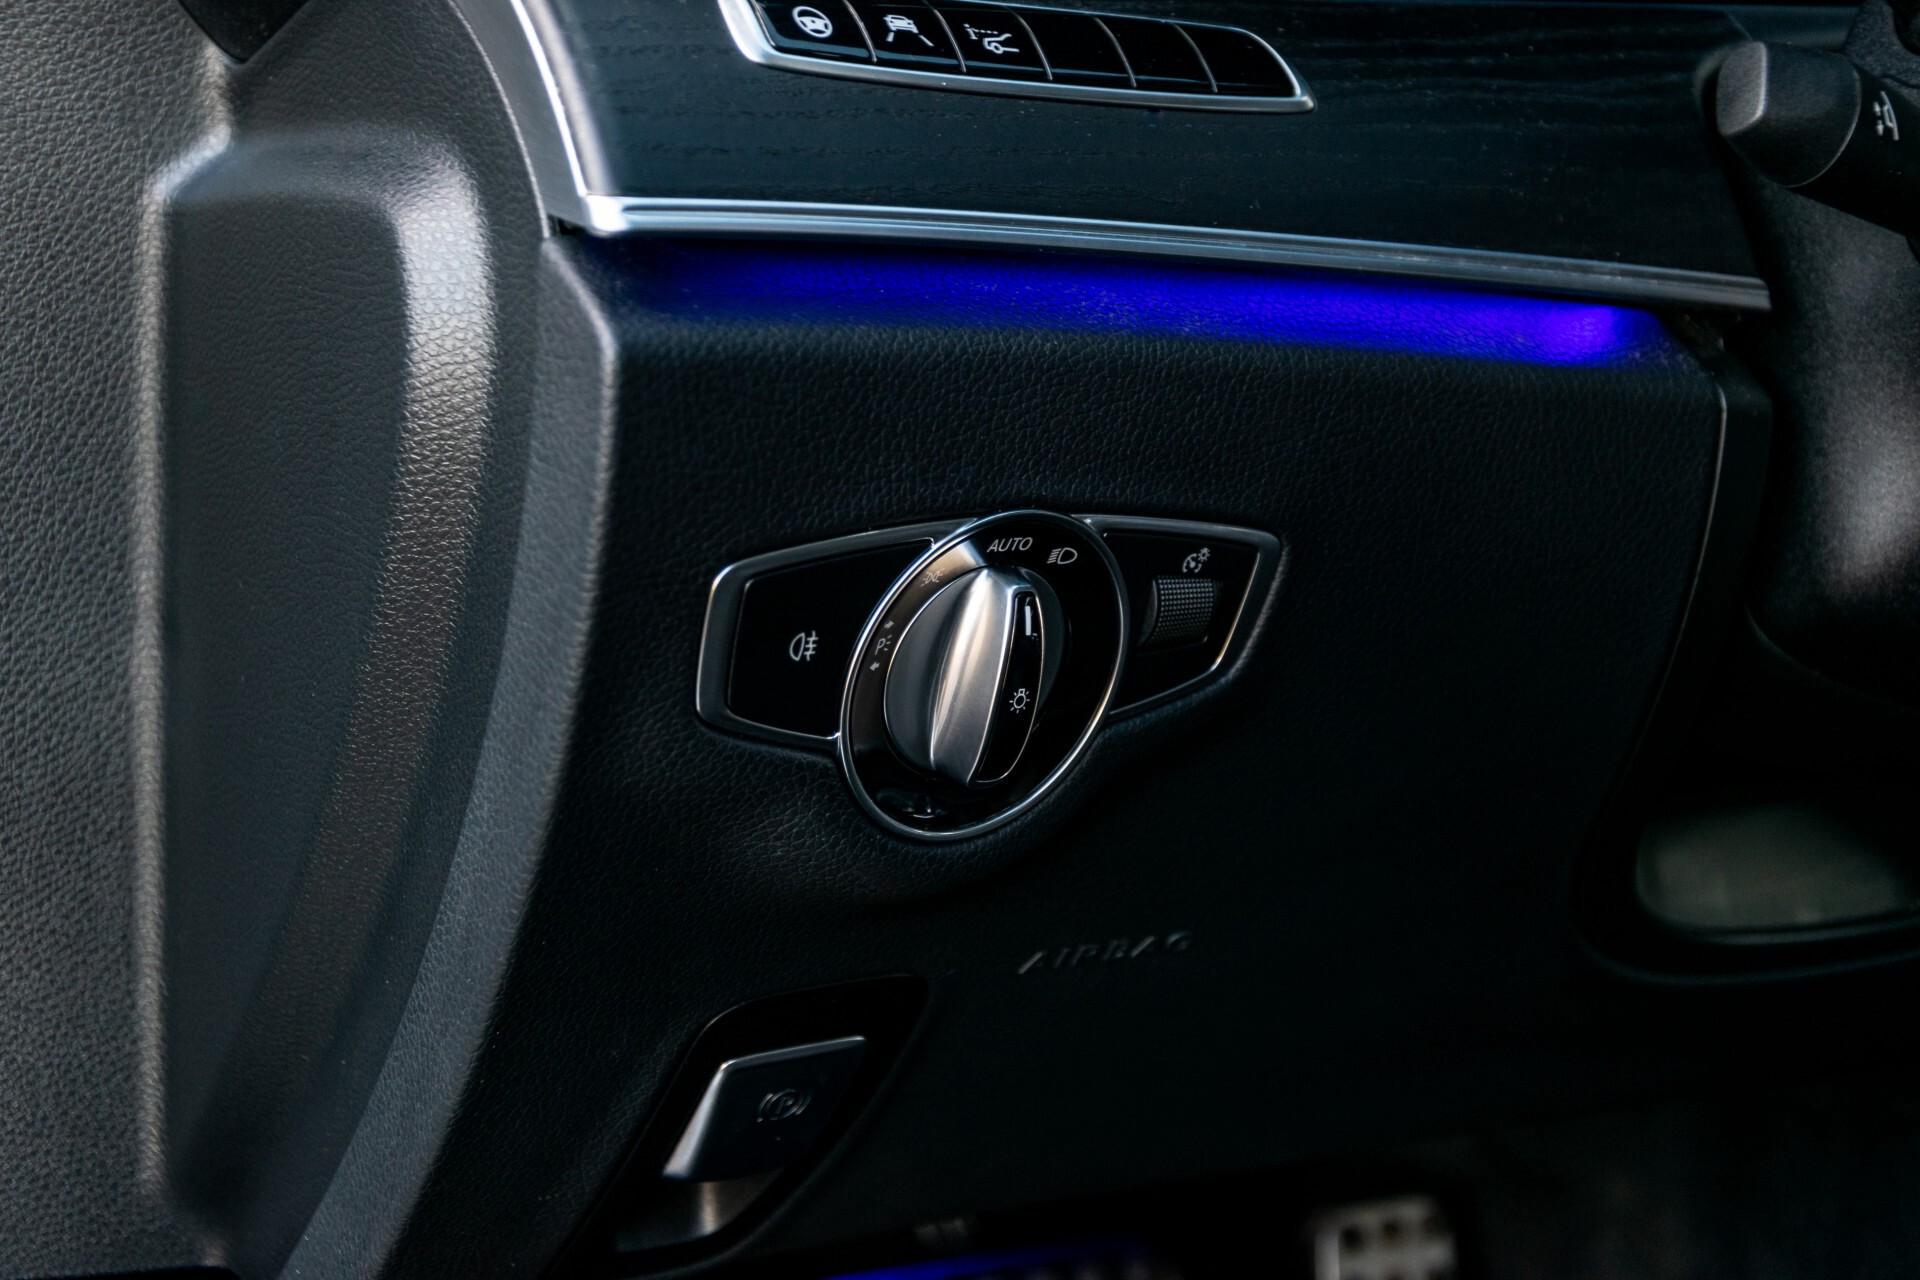 Mercedes-Benz E-Klasse Coupé 300 AMG Panorama/Rij-assist/Keyless/Massage/Memory/HUD/Standkachel/Night Aut9 Foto 44